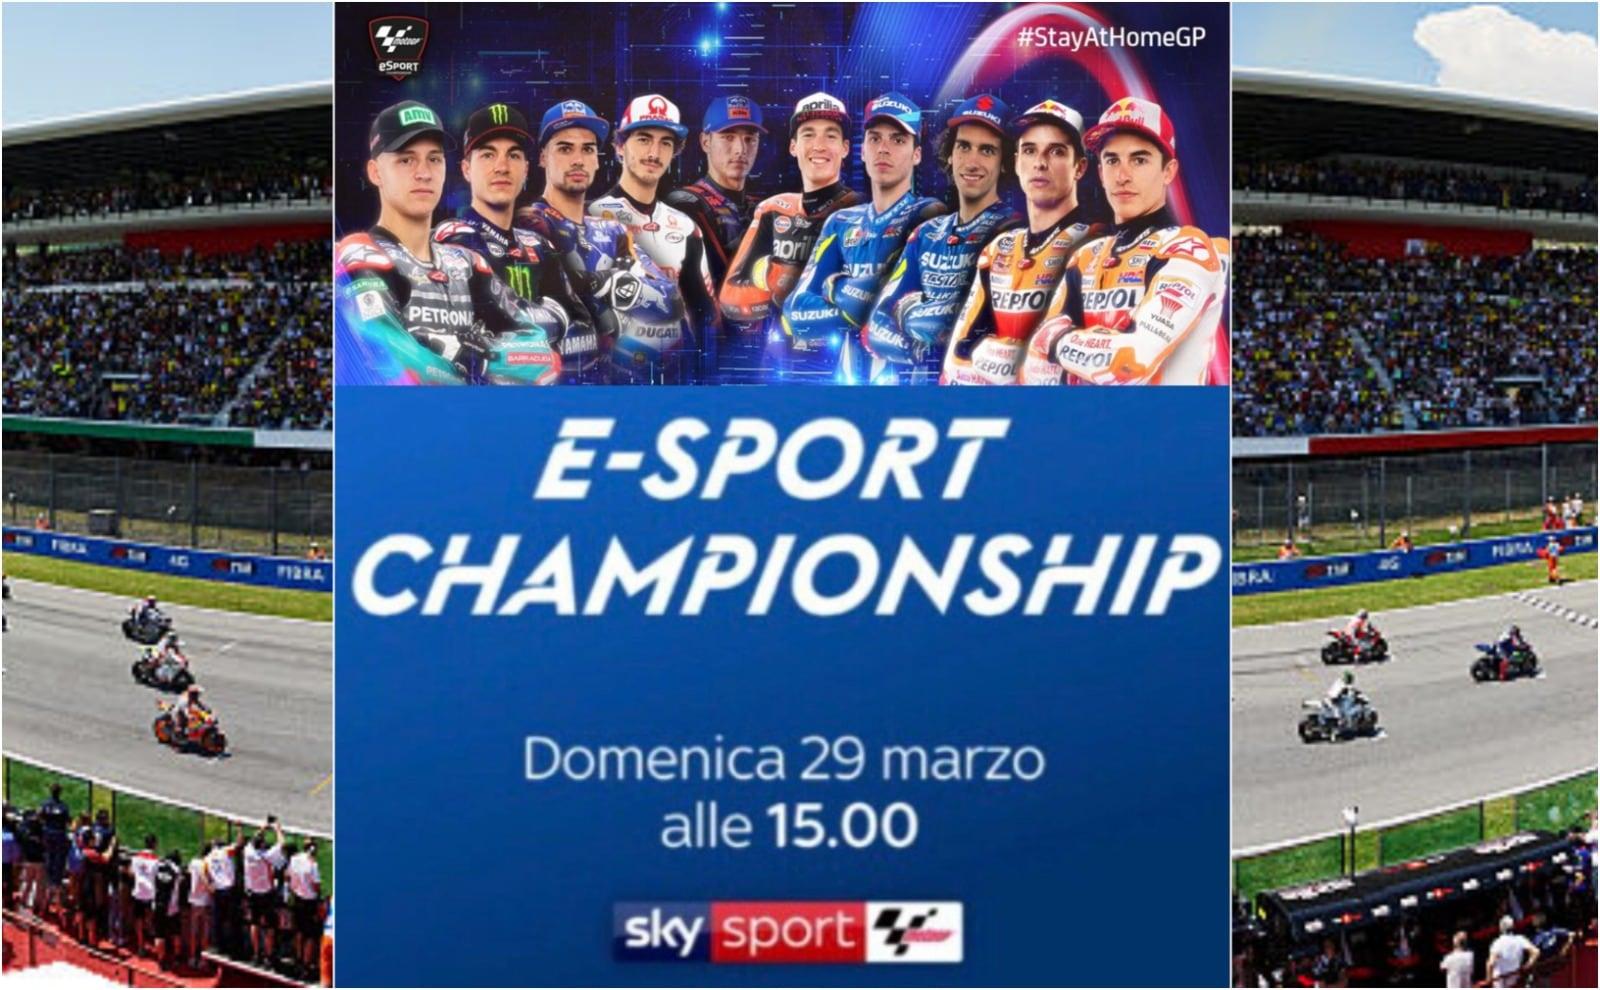 E-Sport Championship